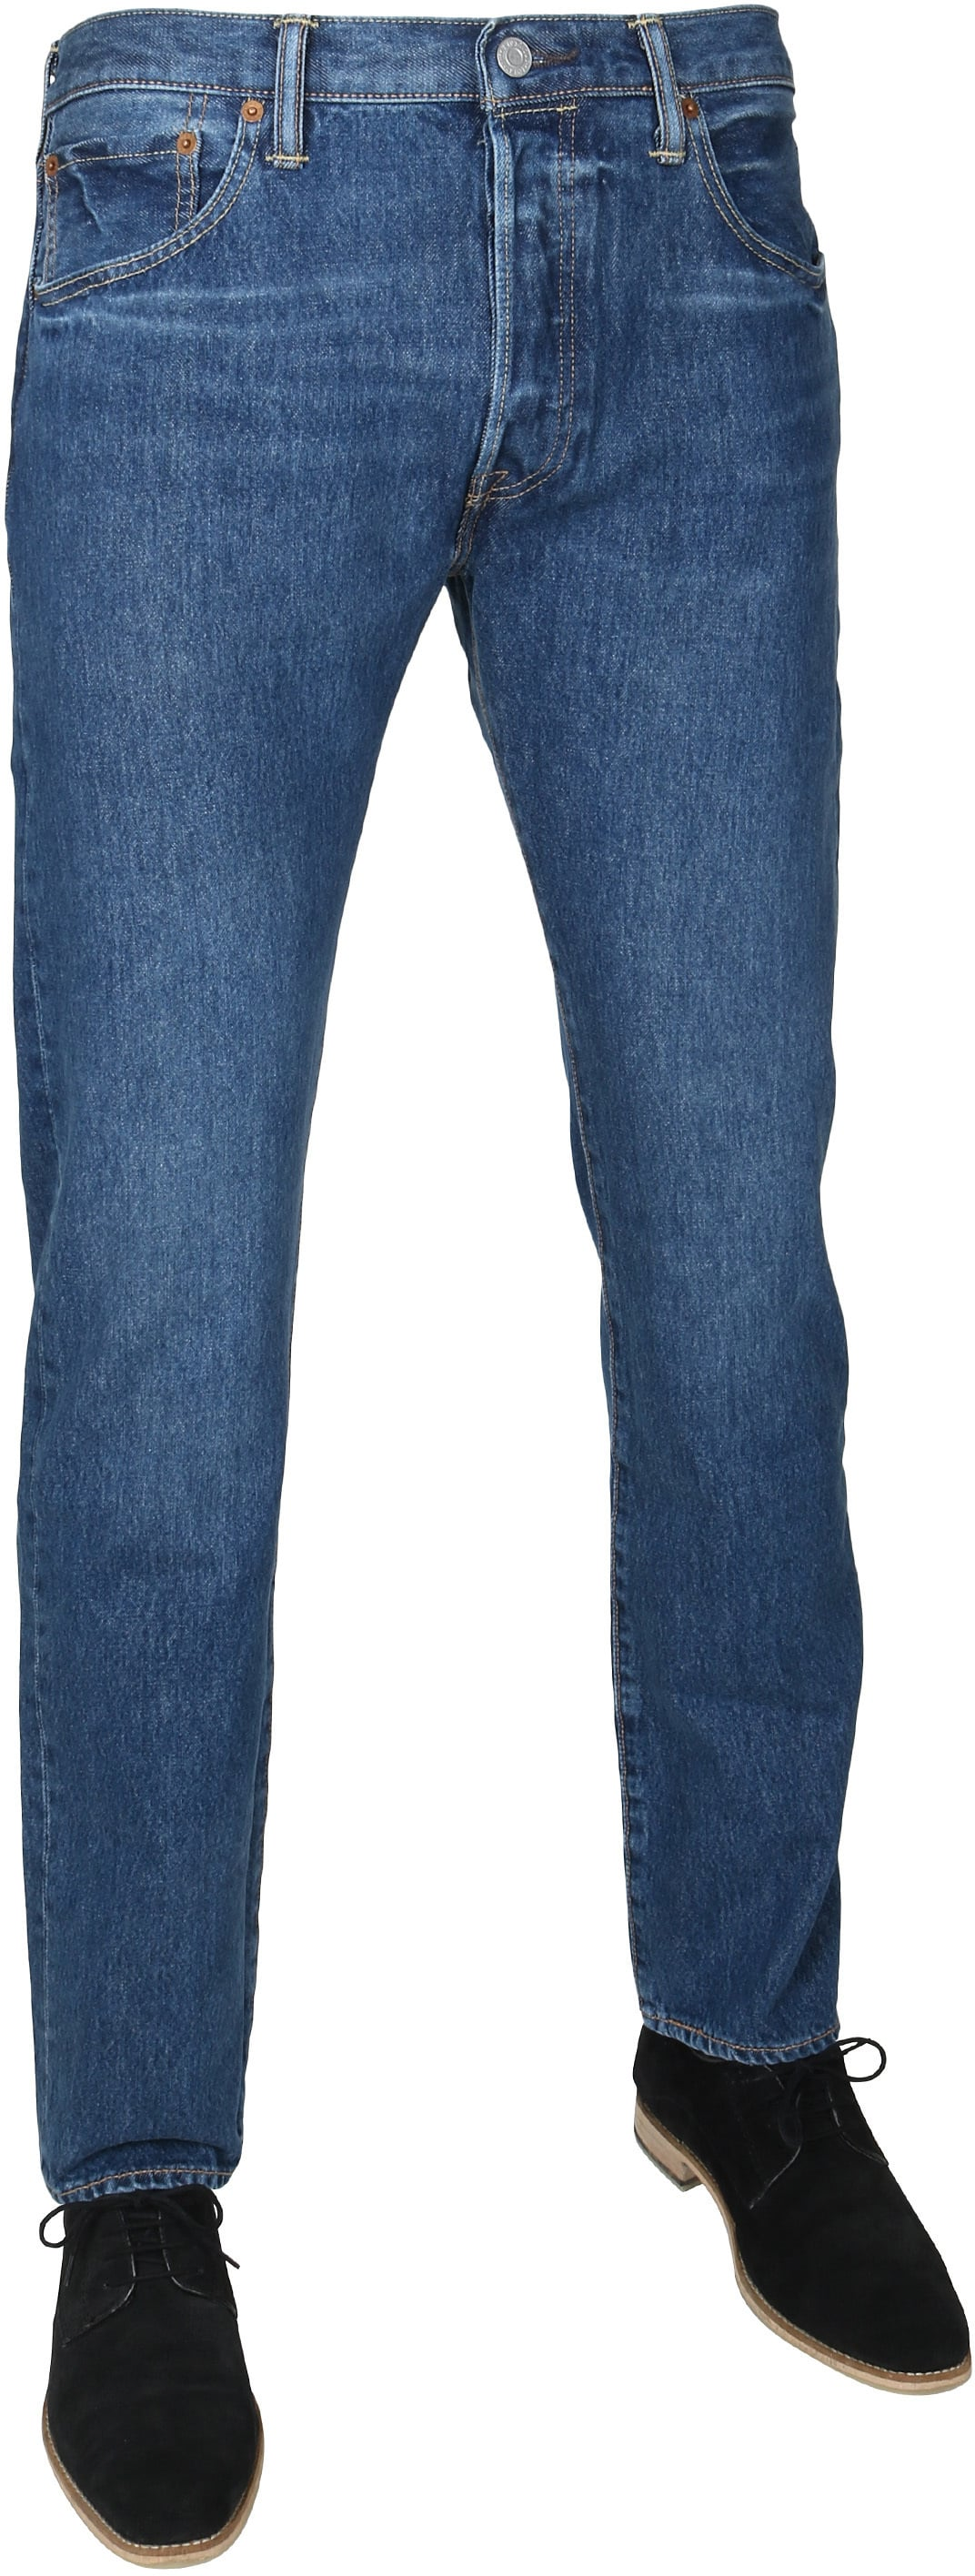 Jeans Original Fit 0 Navy 501 Levi's Foto P1w5xgaEq